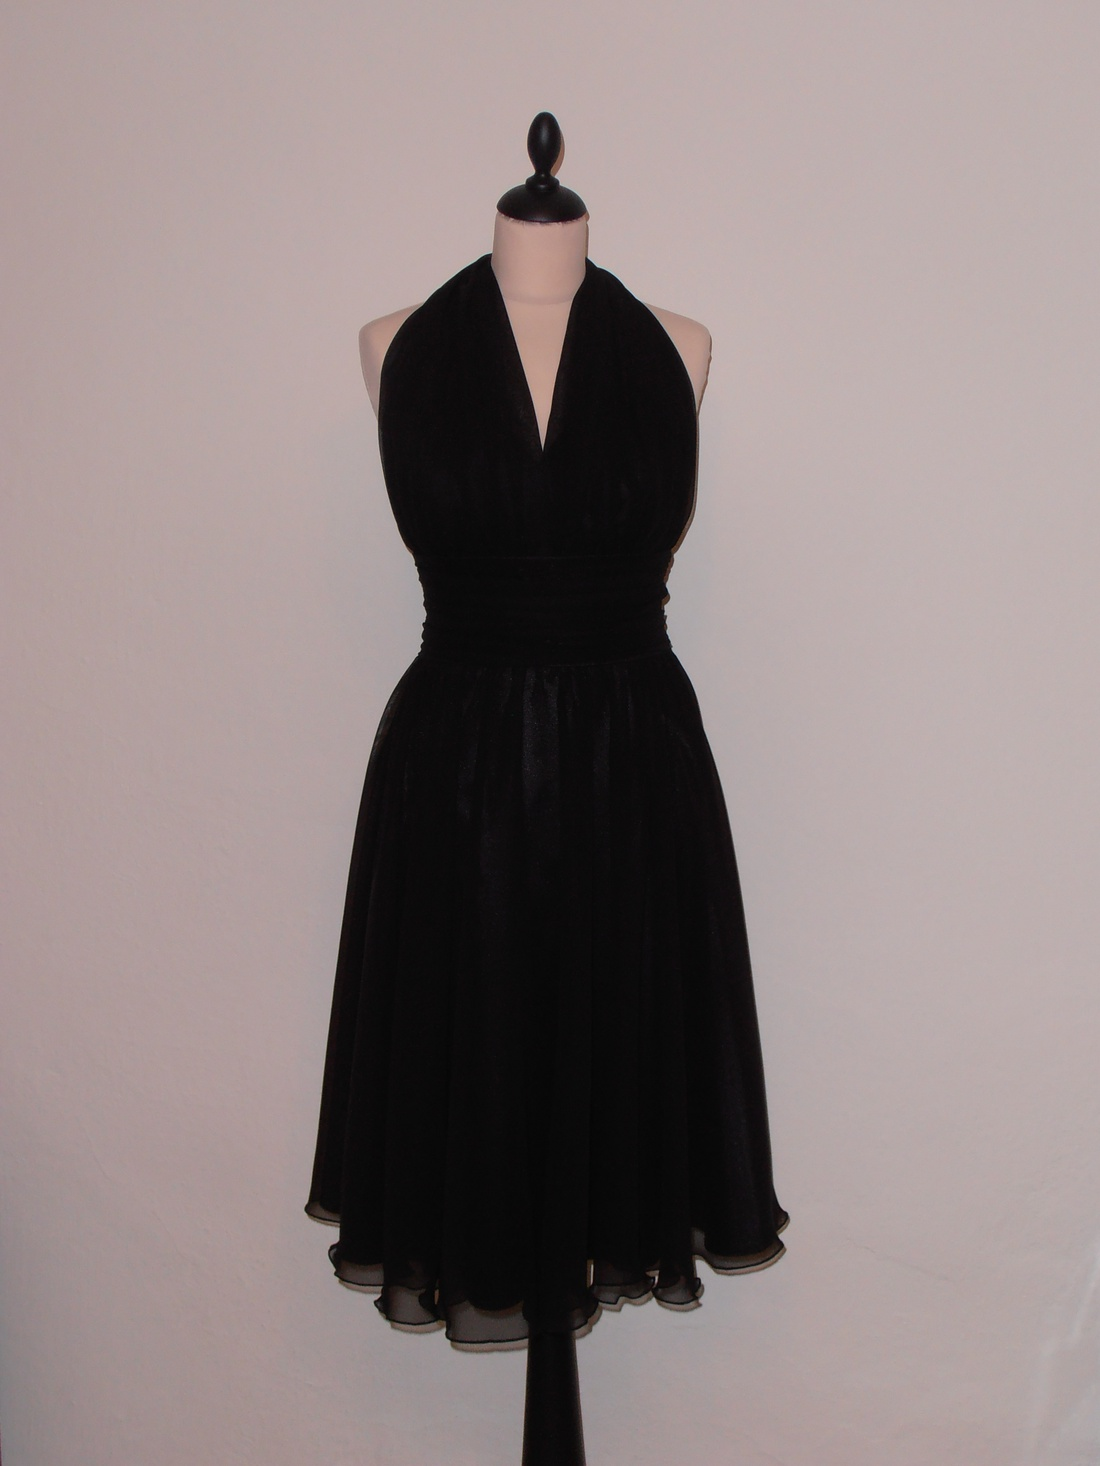 Fekete muszlin ruha Marilyn (nicoledesign) - Meska.hu a18cf61366